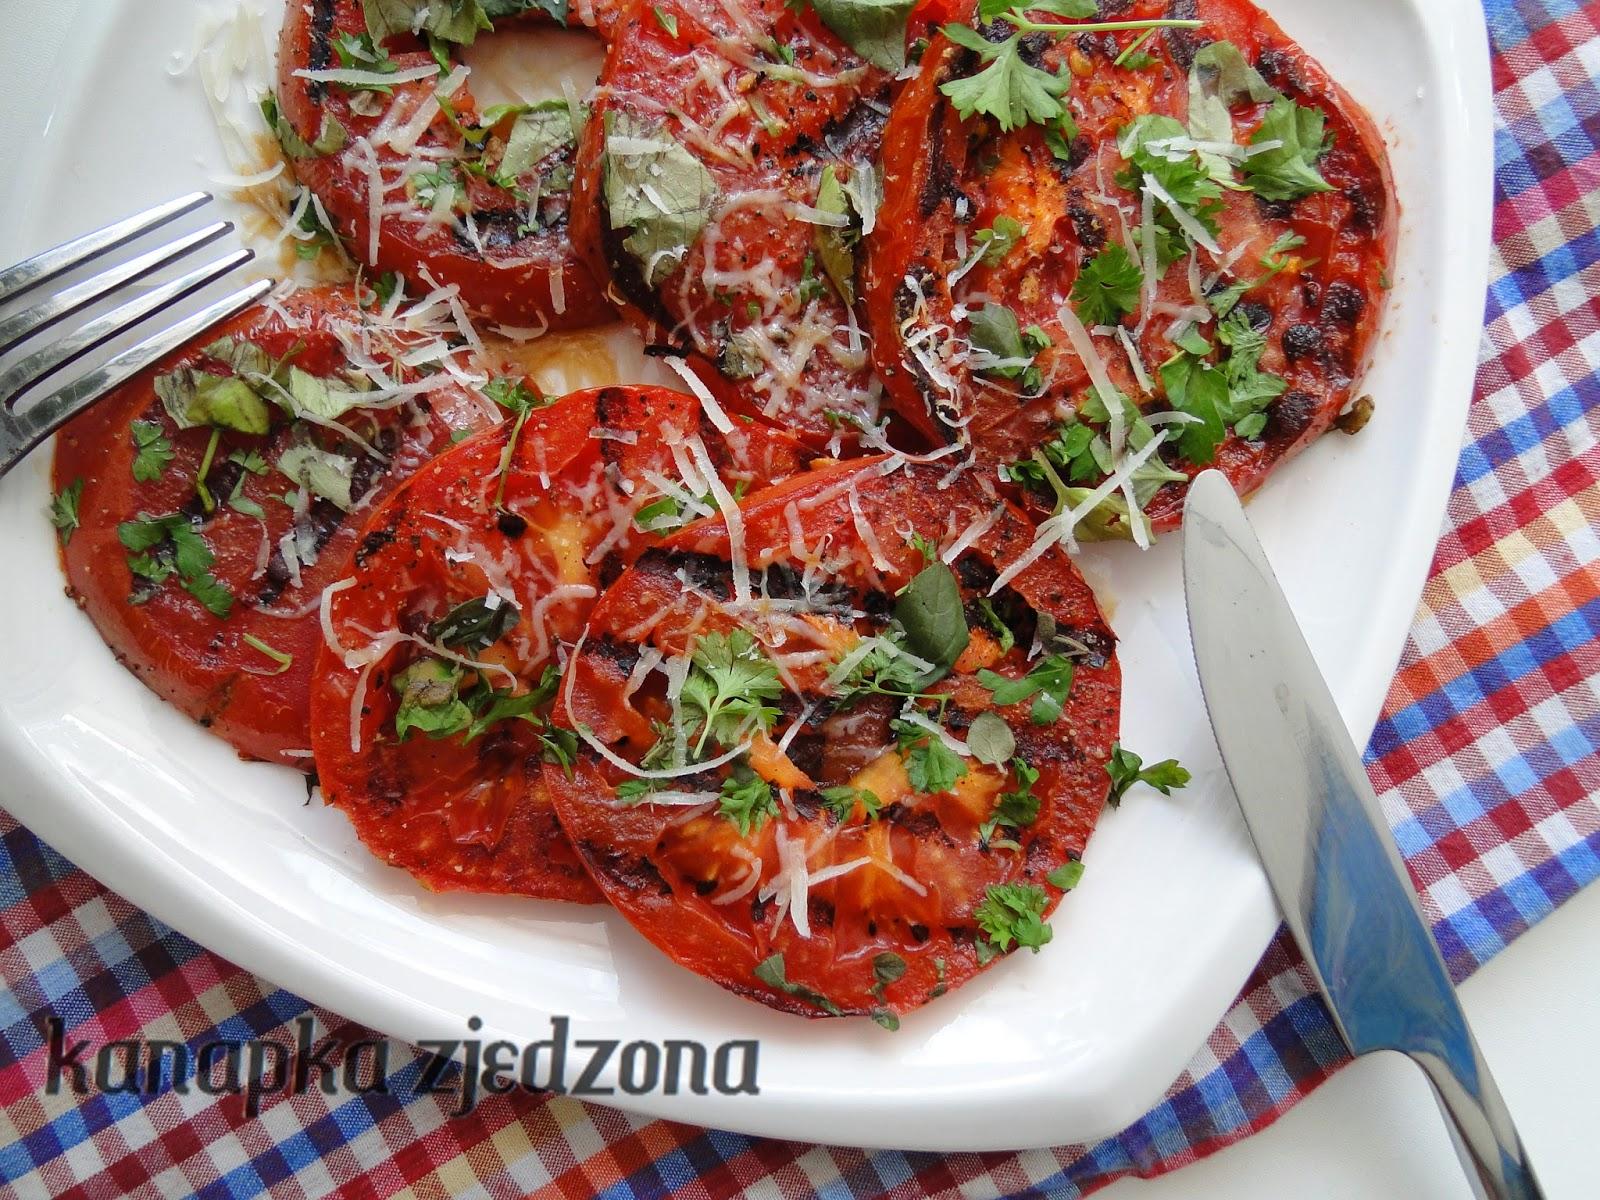 tomates grillées, gegrillten Tomaten, tomates a la parrilla, grilled tomatoes